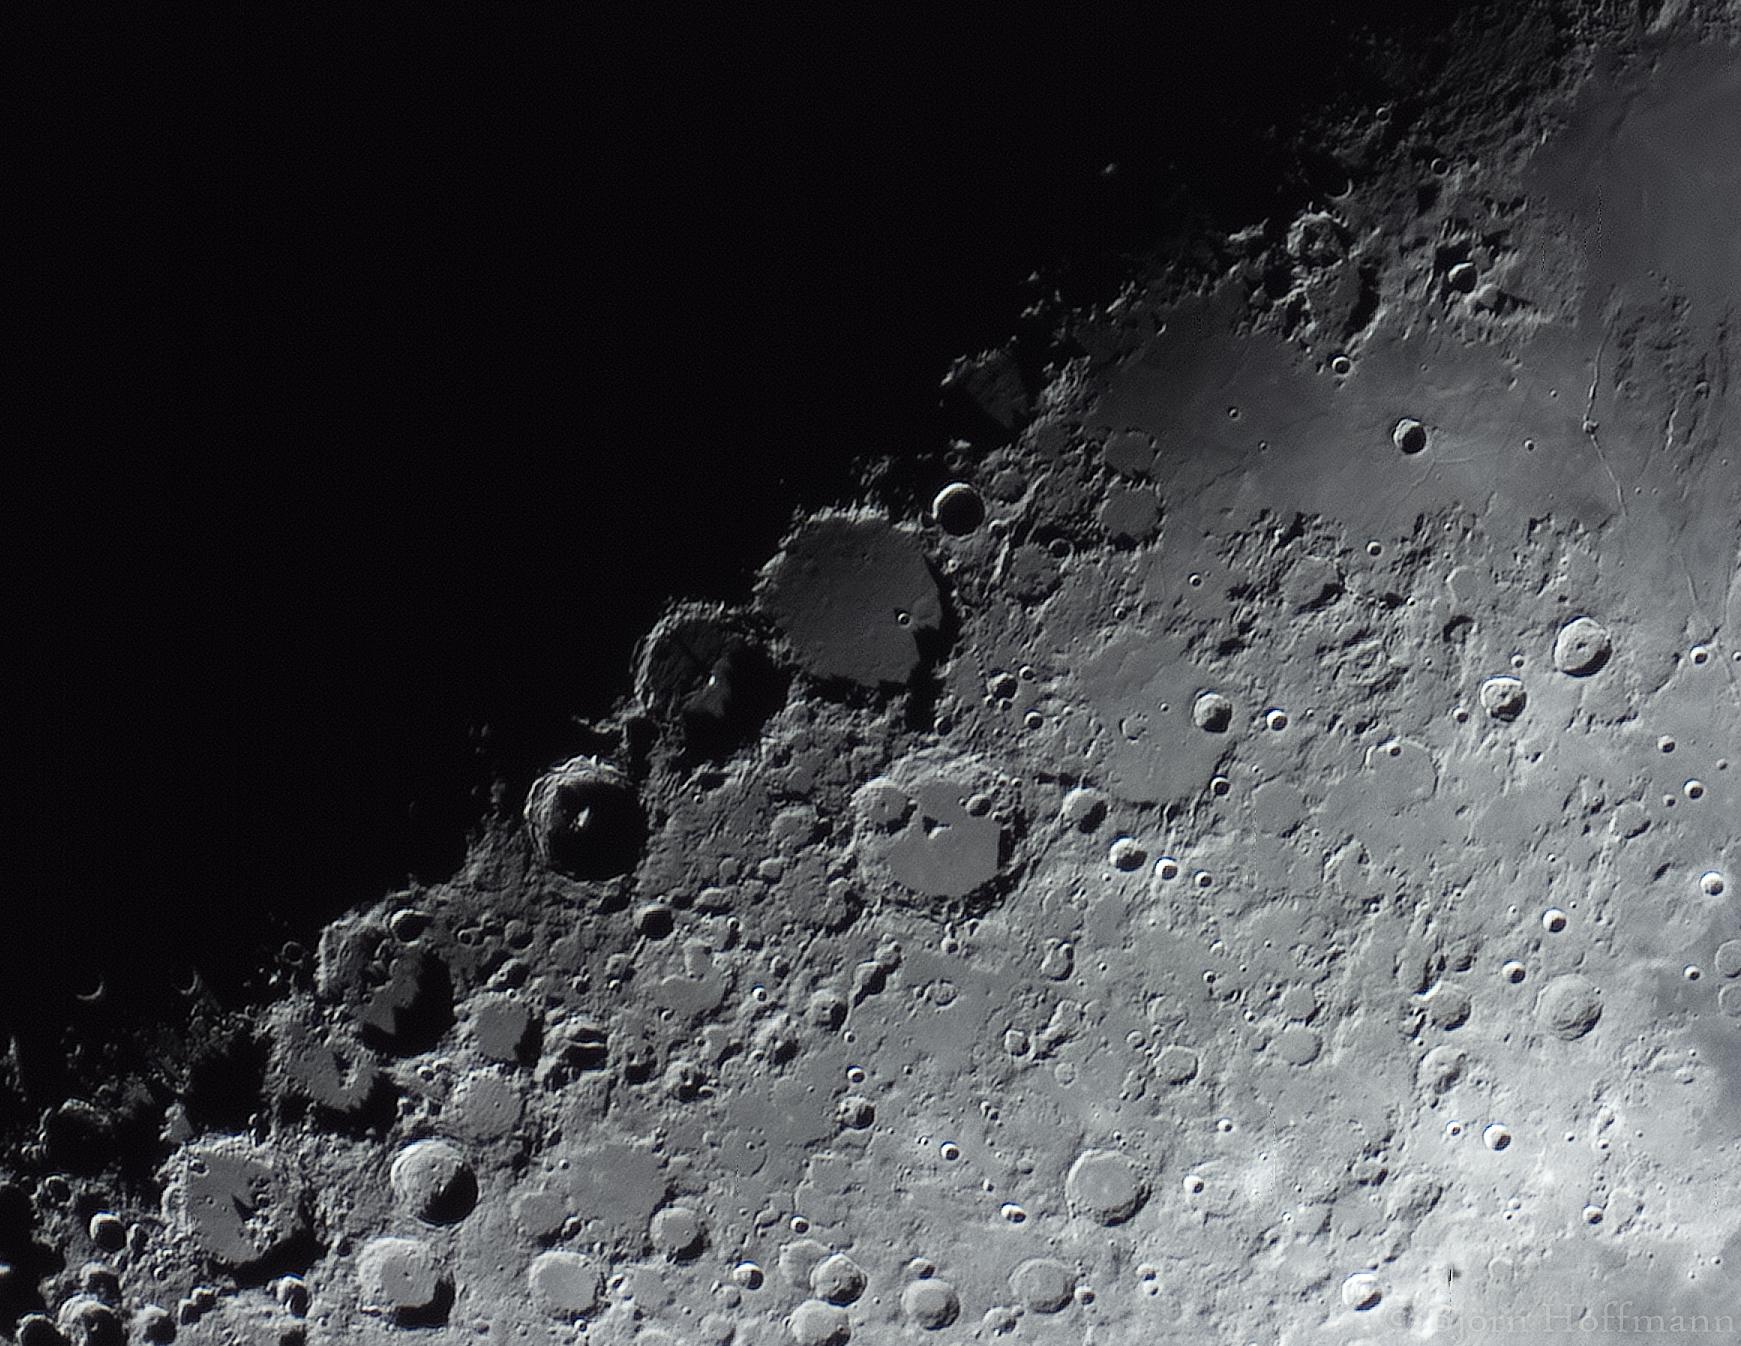 moon_hqlinear_gain300_exposure4-10pro-1